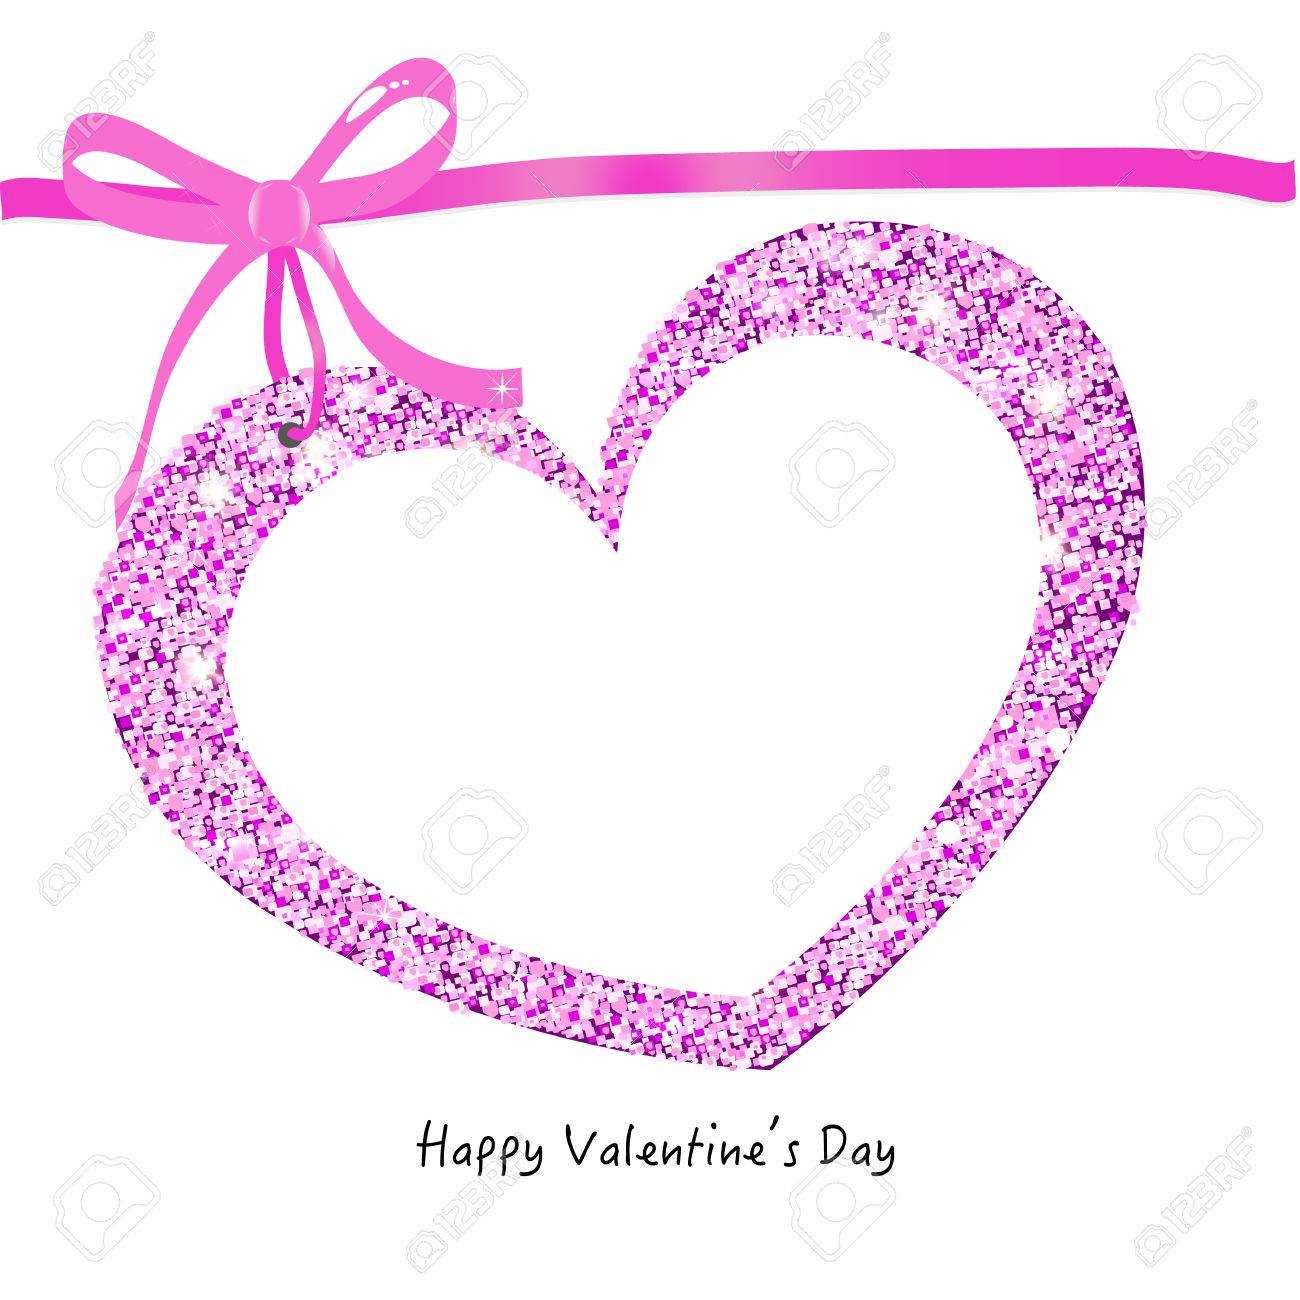 valentines day card background - Hizir kaptanband co